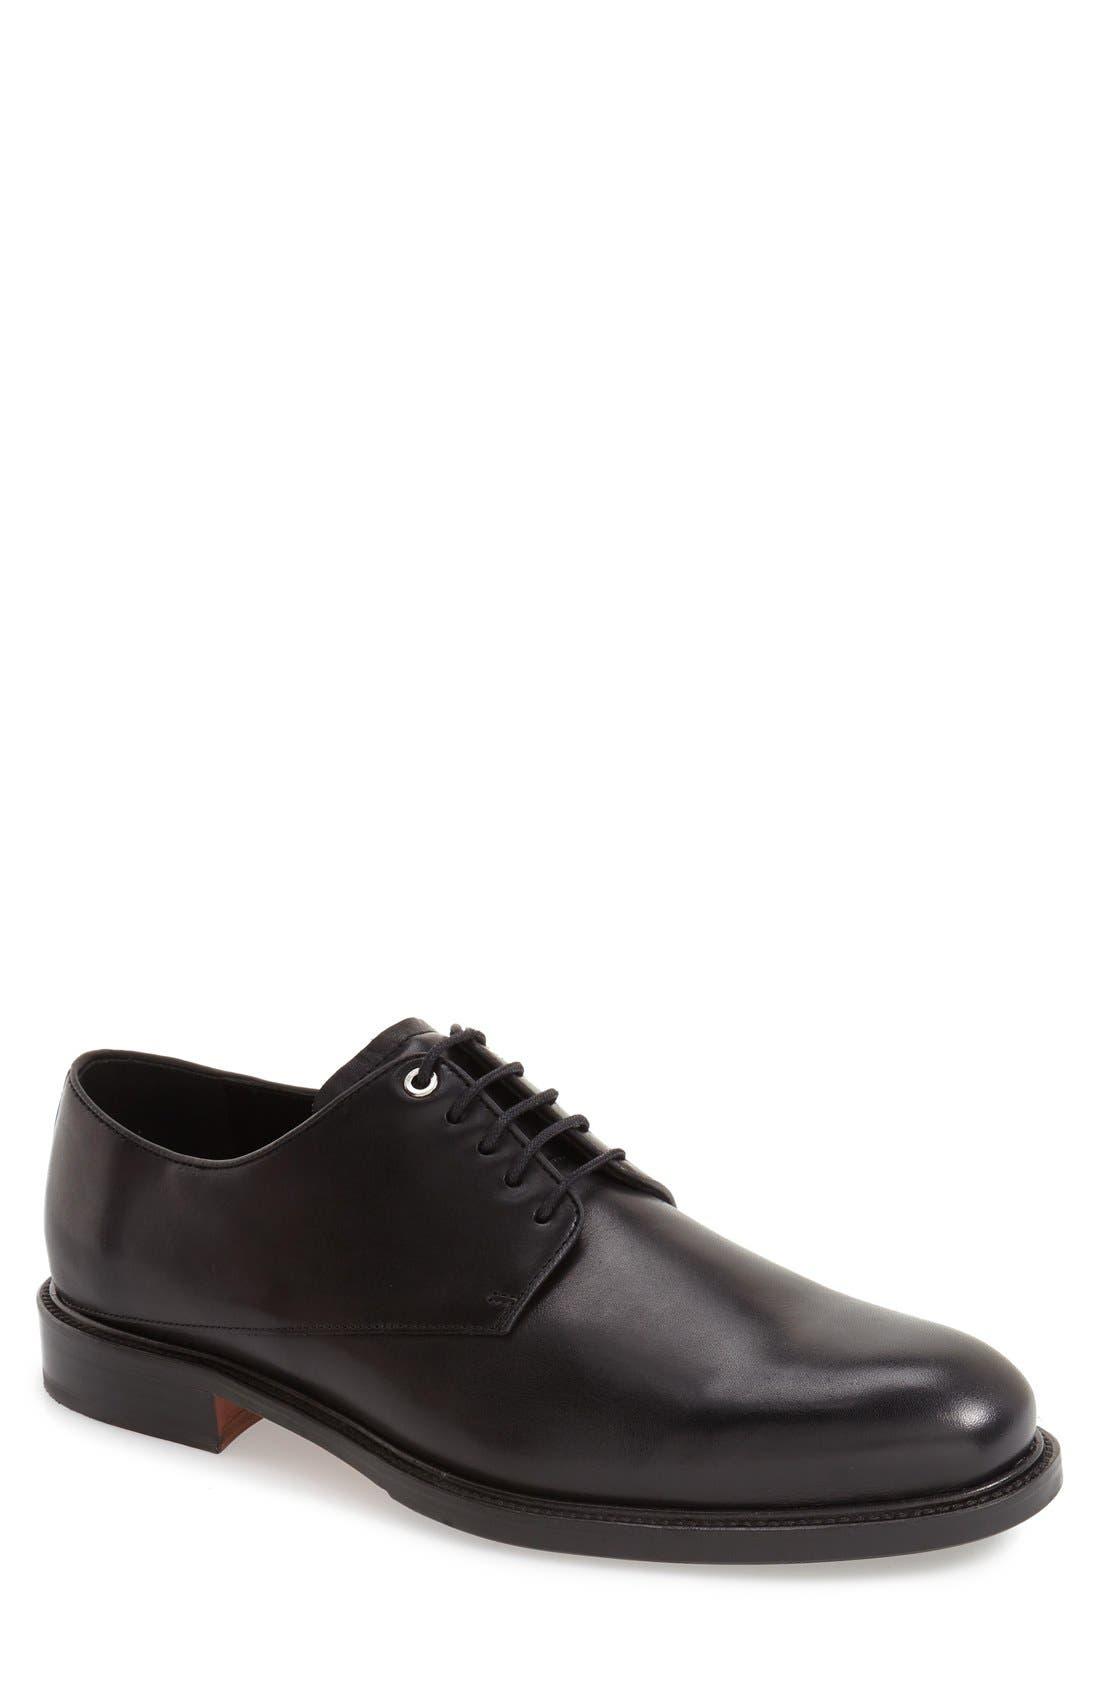 'Benson' Plain Toe Derby,                         Main,                         color, Box Black Leather